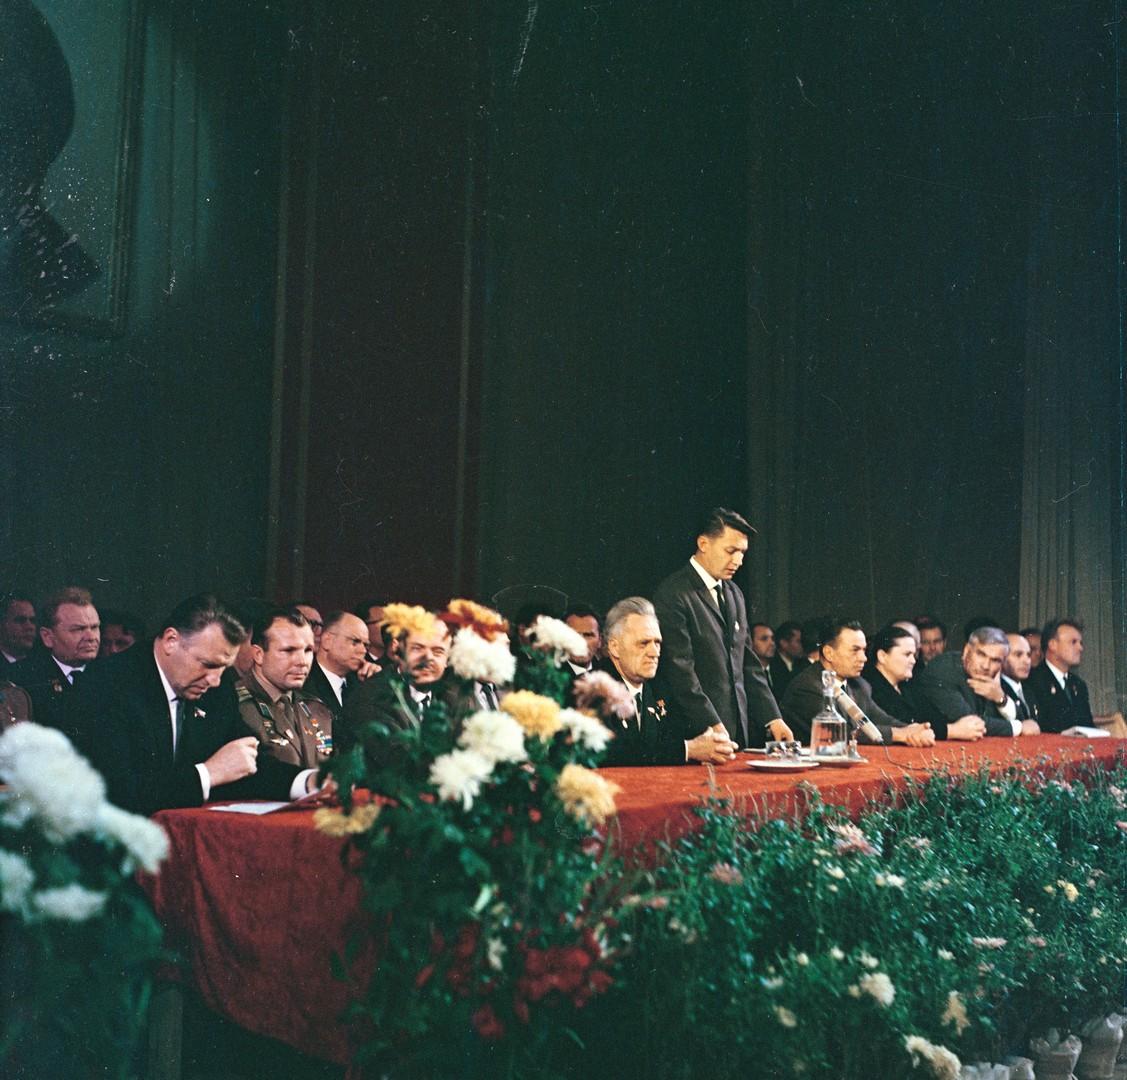 С.А. Афанасьев, Ю.А. Гагарин, Н.А. Пилюгин и другие. Москва. 1966 г.